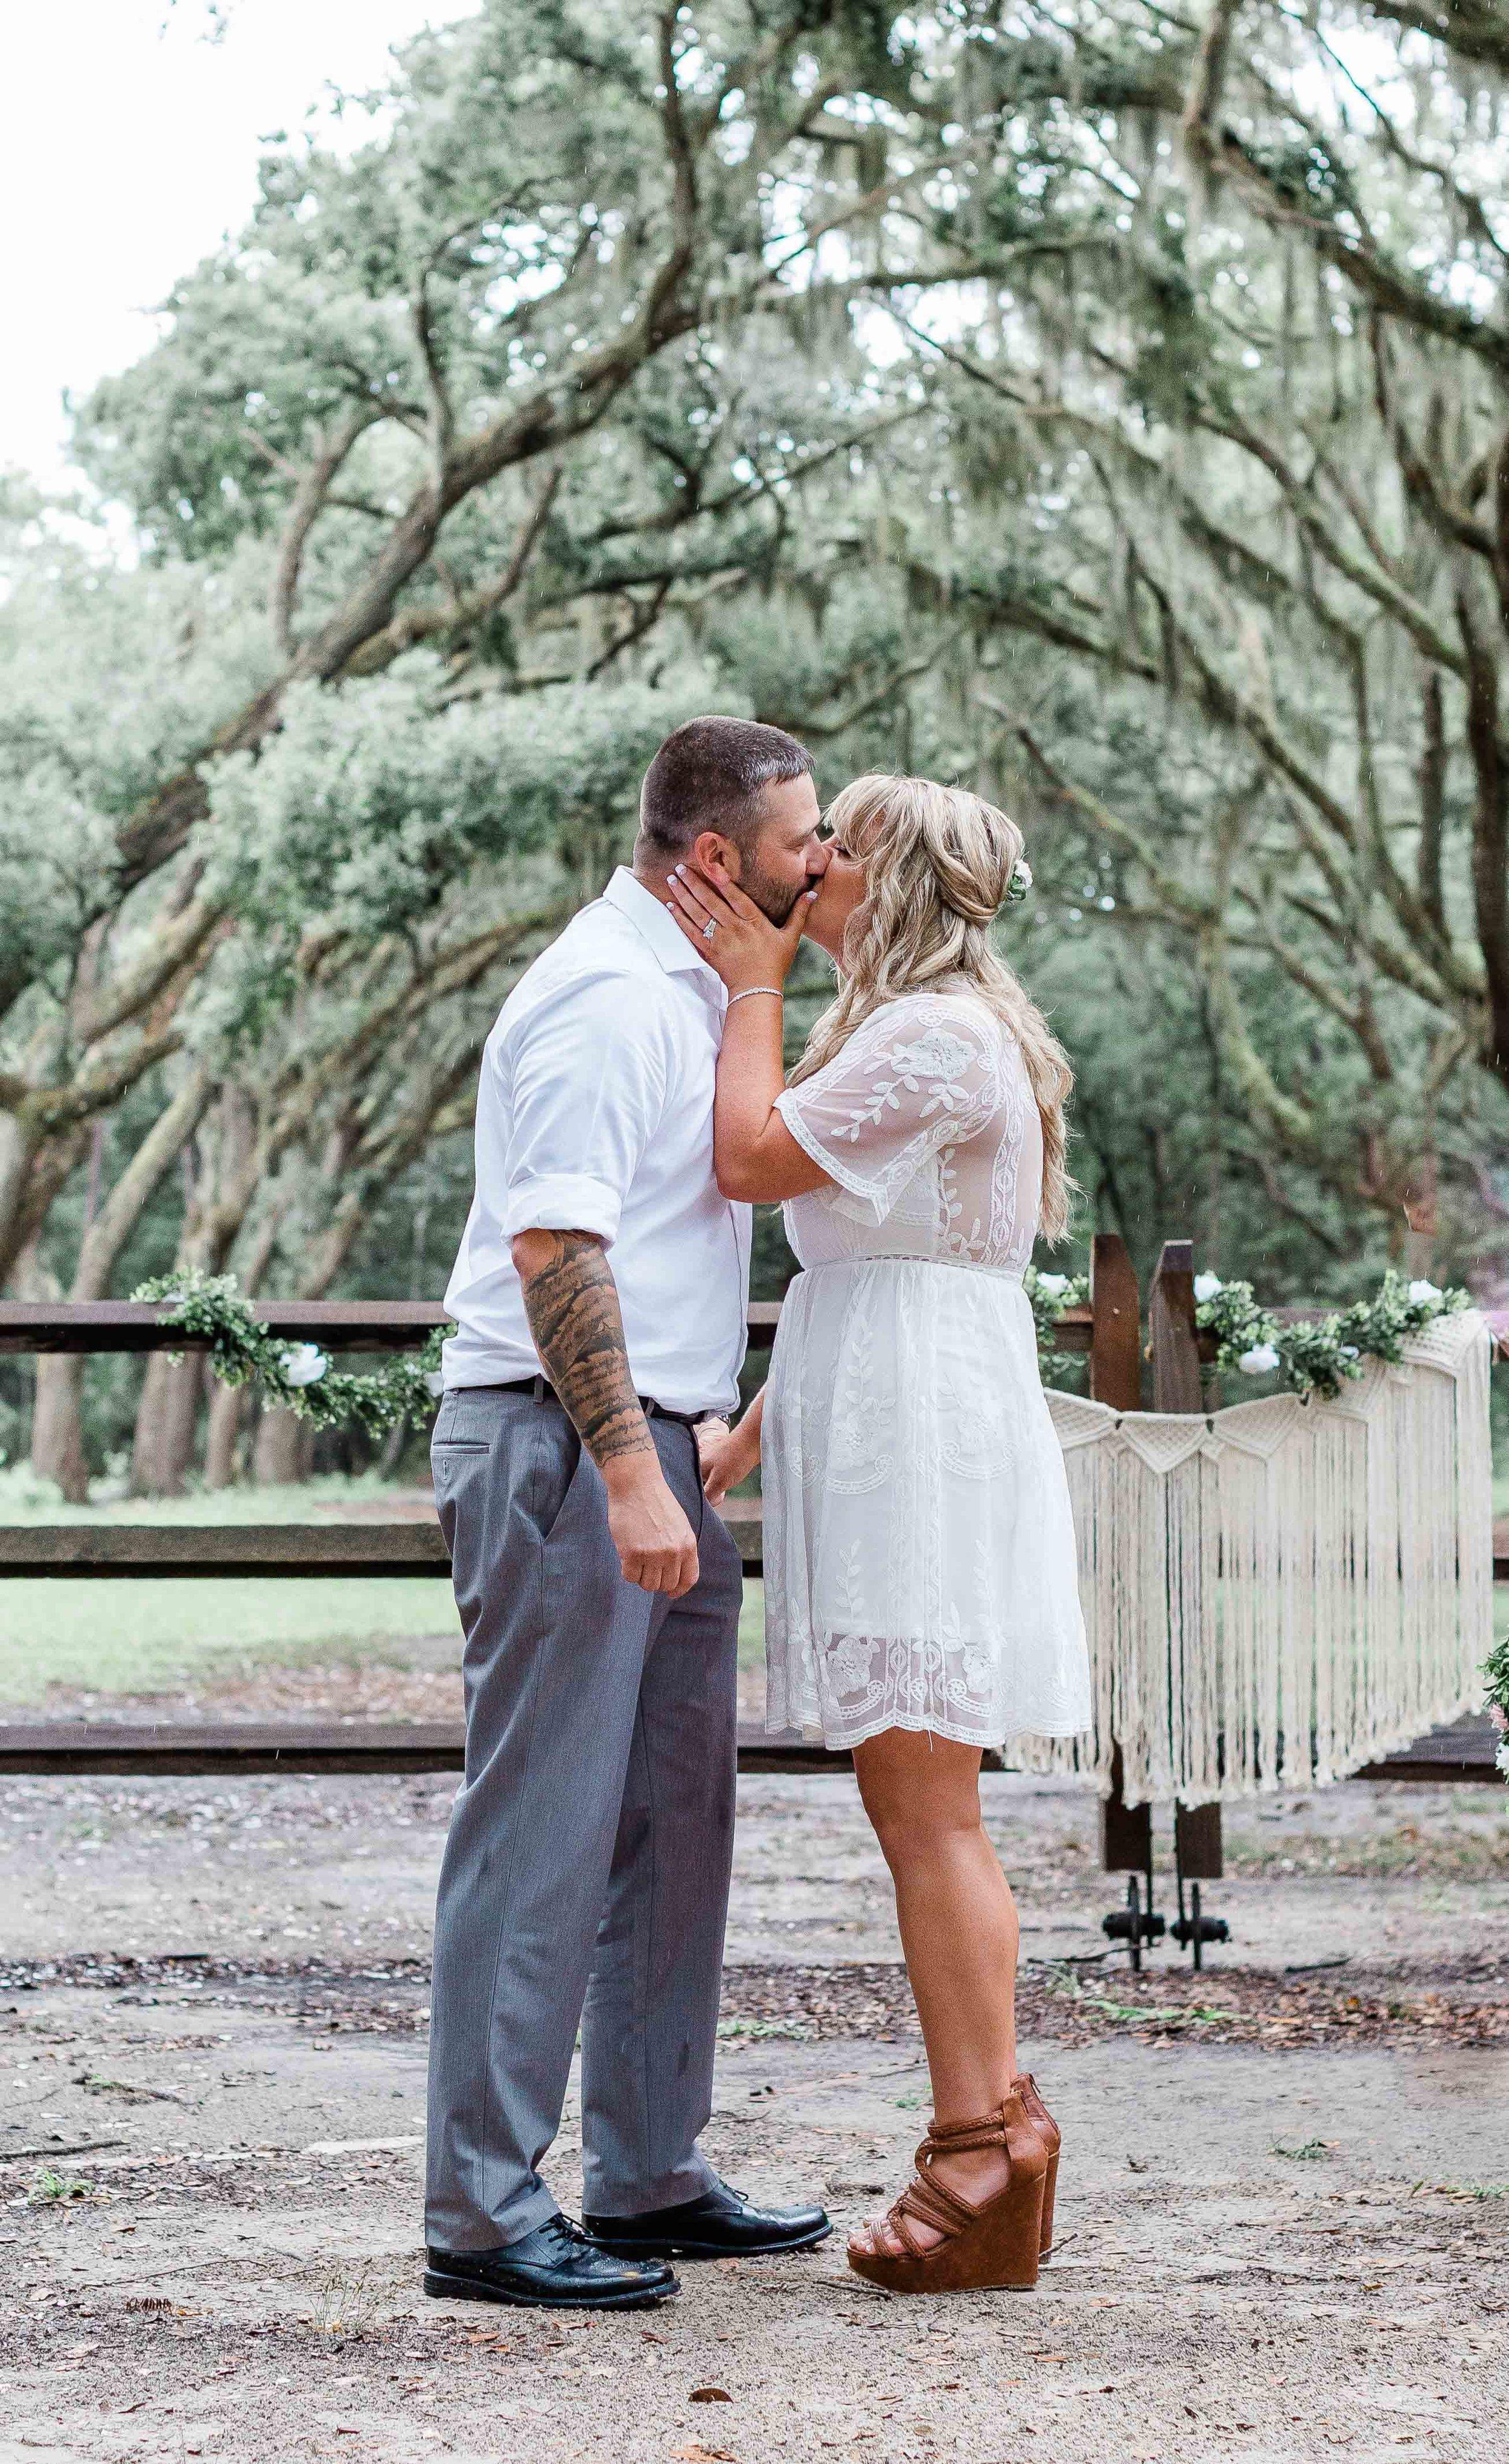 20190727Georgia-Wormlsoe Plantation-Simply Eloped-Savannah Wedding Photographer- Southern Lens Photography04.jpg